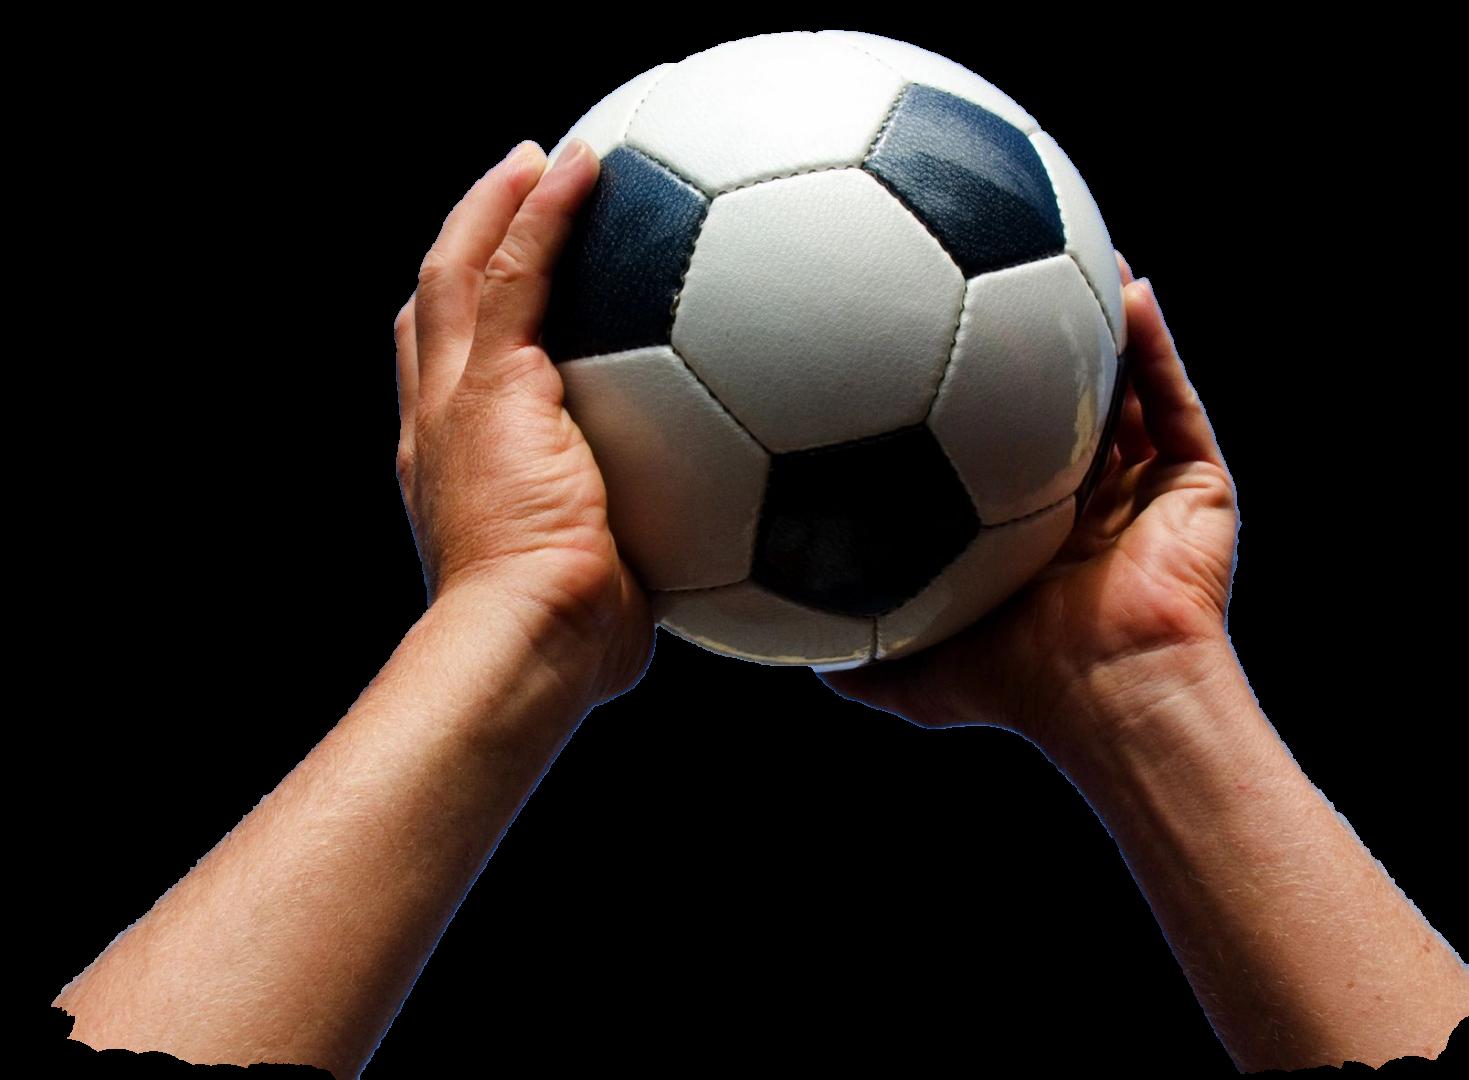 soccer-ball1-trans